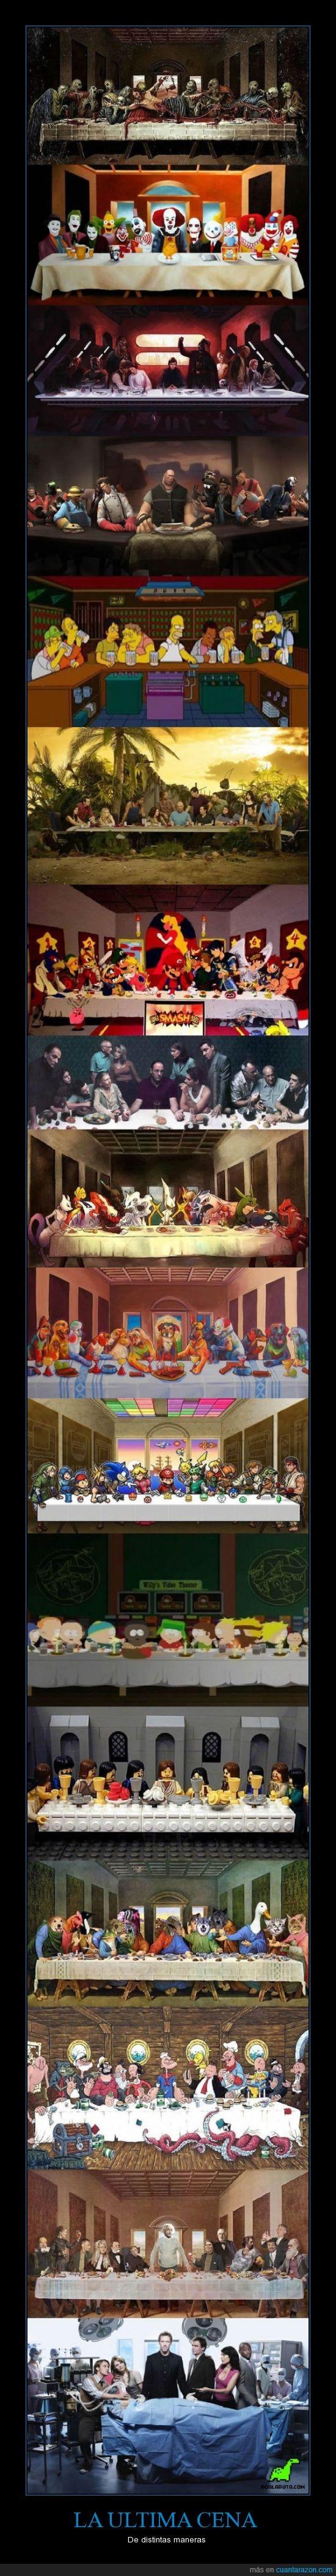 animales,Cena,Dr House,Einstein,los simpson,maneras,Mario,Payasos,pensadores,perros,personaje,Pokemón,Popeye el marino,series,The Jocker,ultima cena